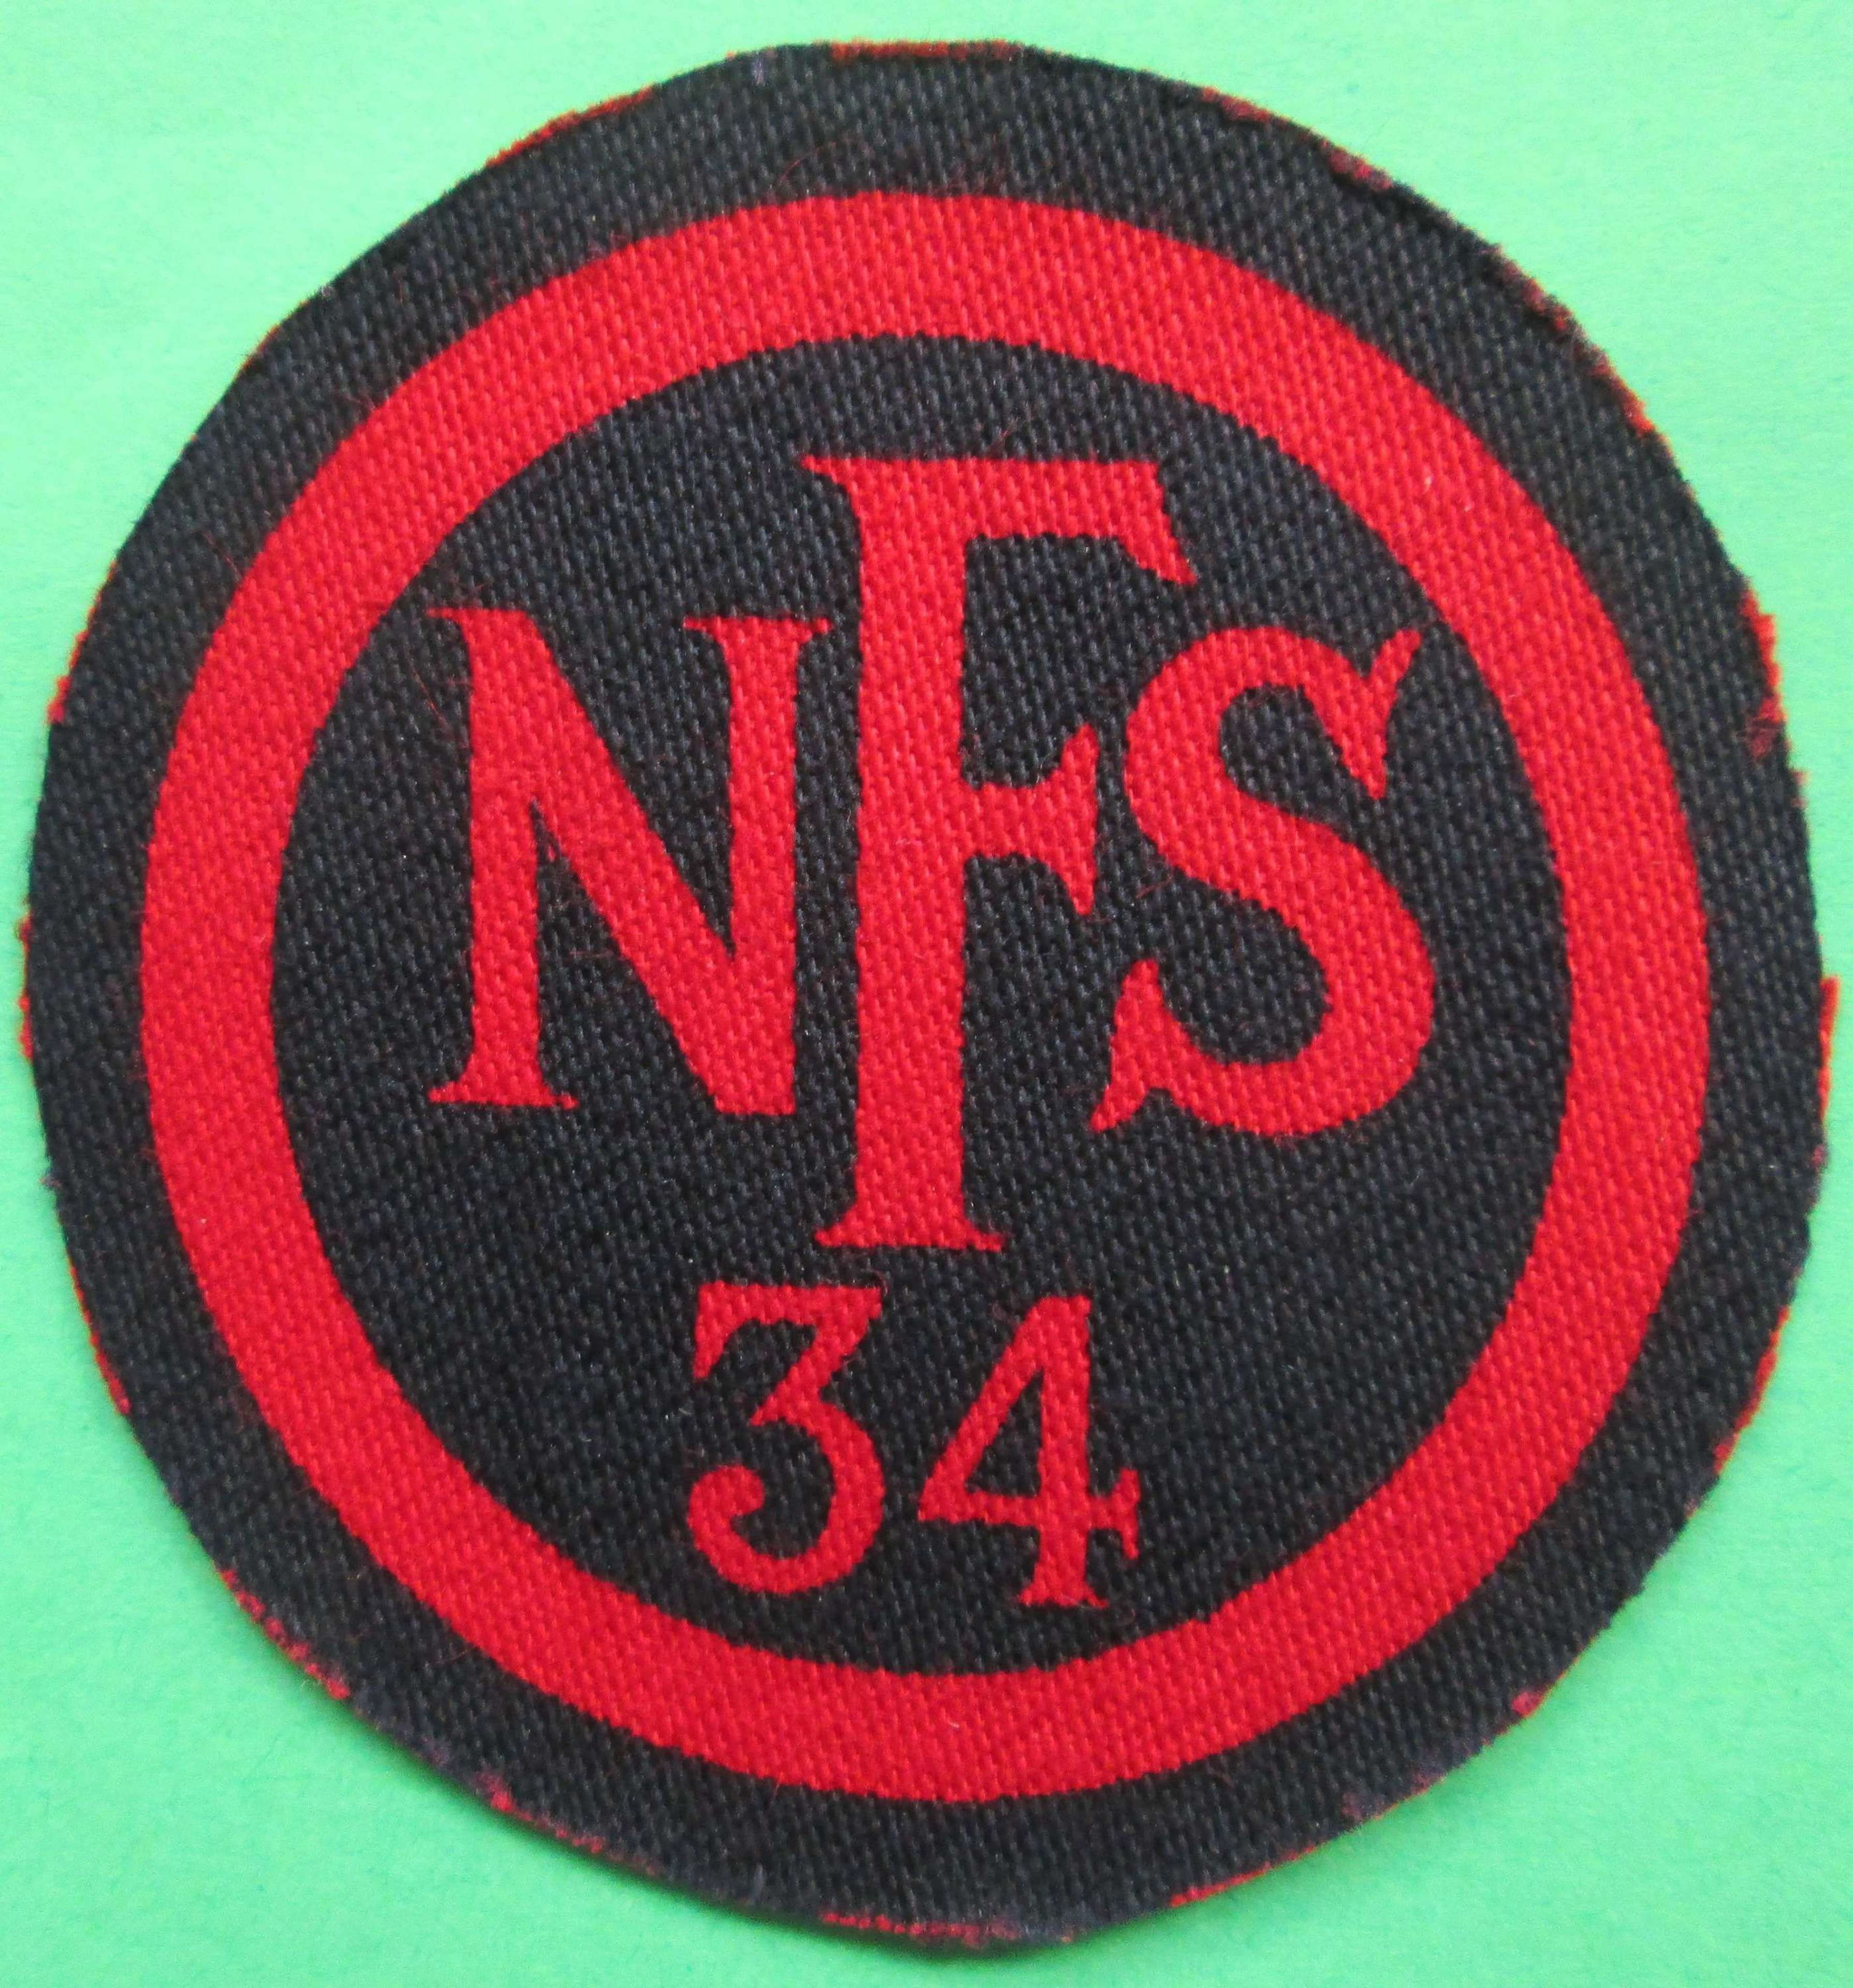 NATIONAL FIRE SERVICE AREA 34